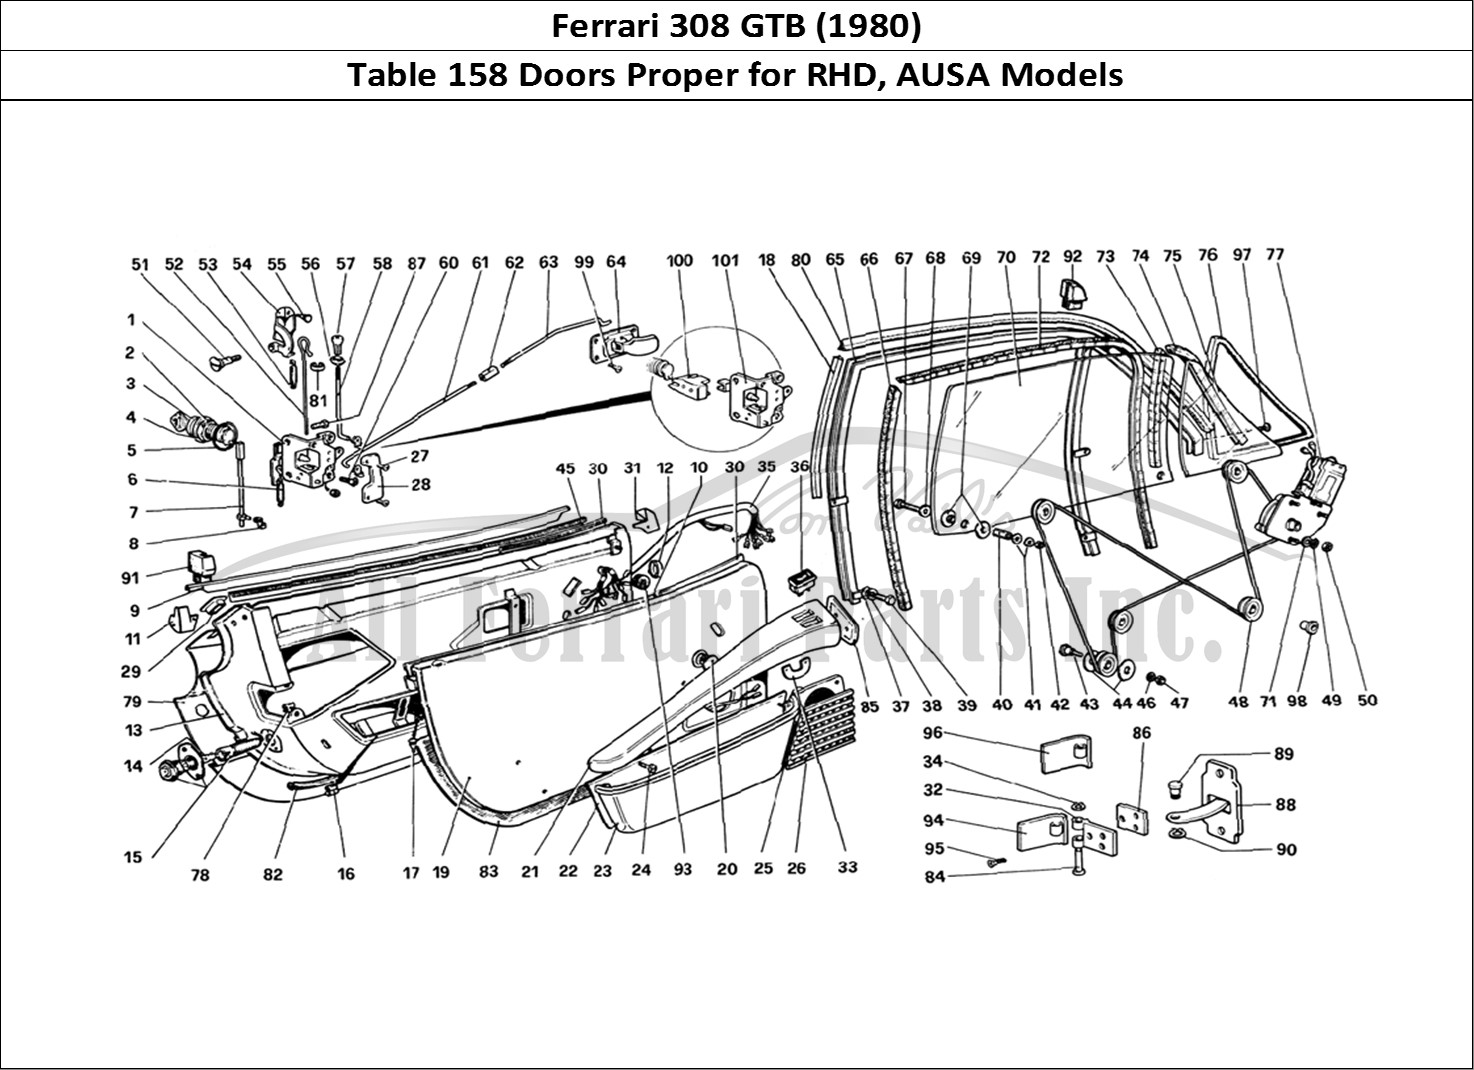 Ferrari Parts Diagram - Wiring Diagrams on ferrari 308 qv wiring, ferrari 308 gts,